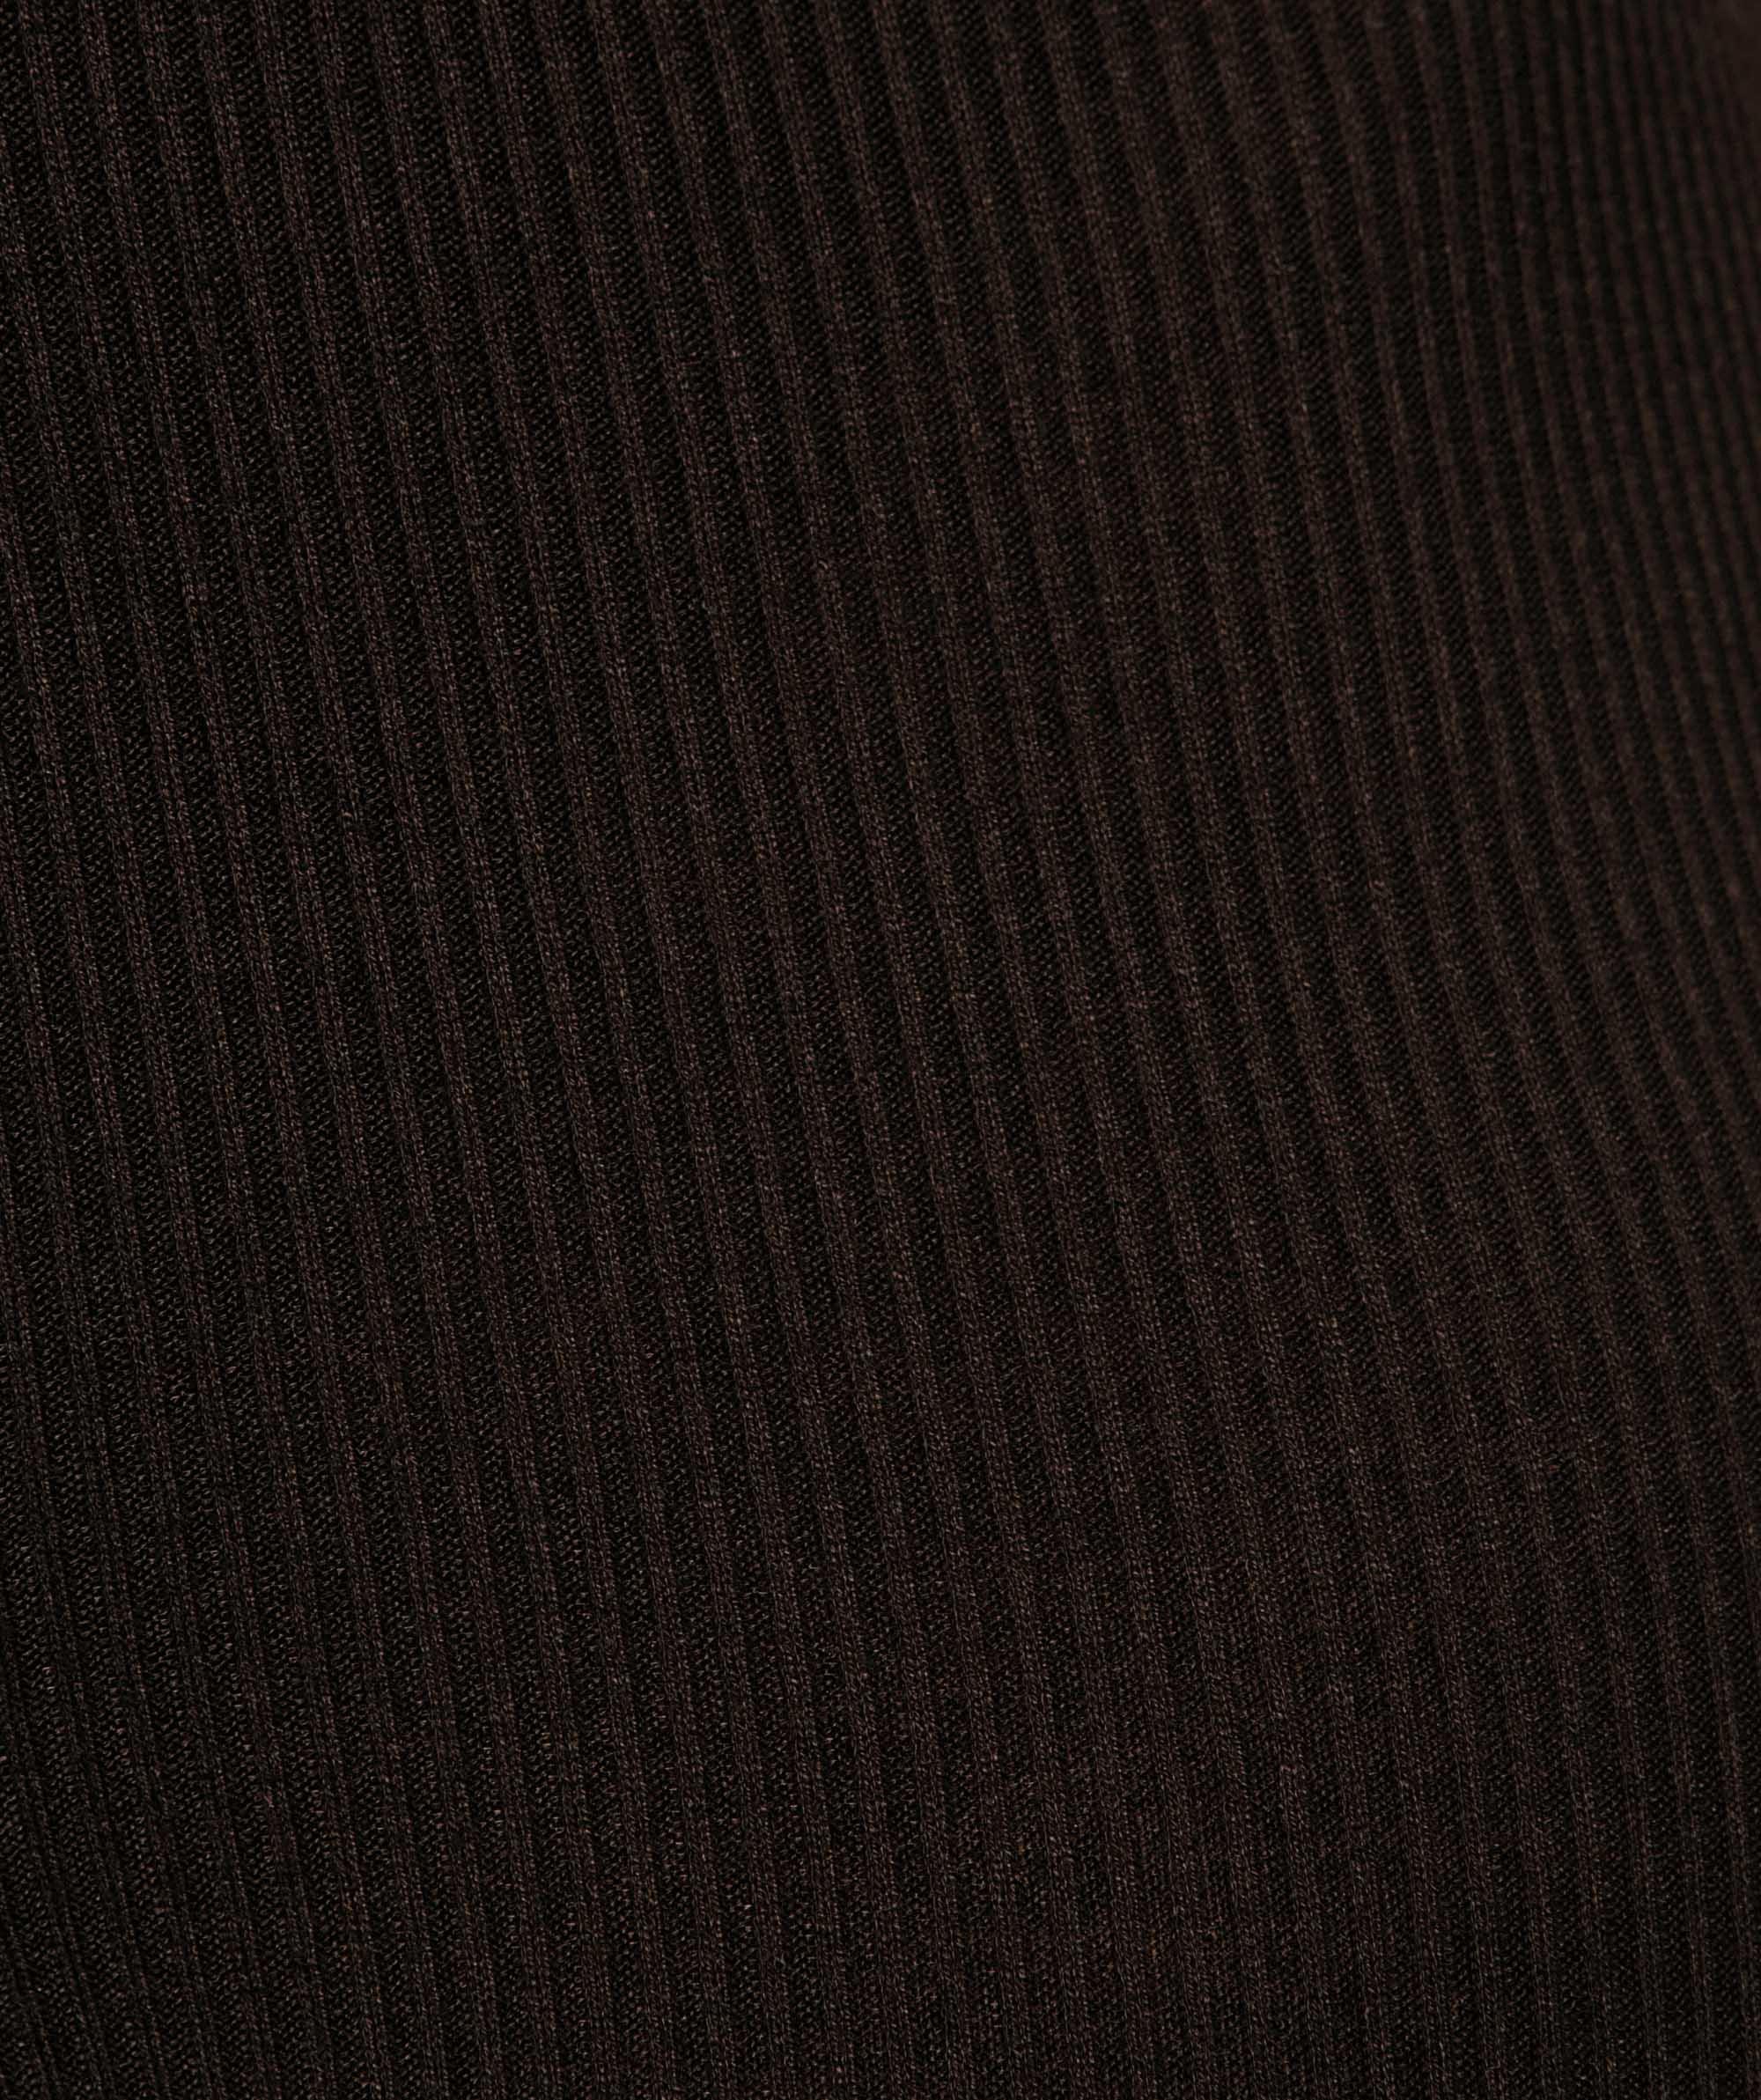 Style By Day Bike Shorts - Black